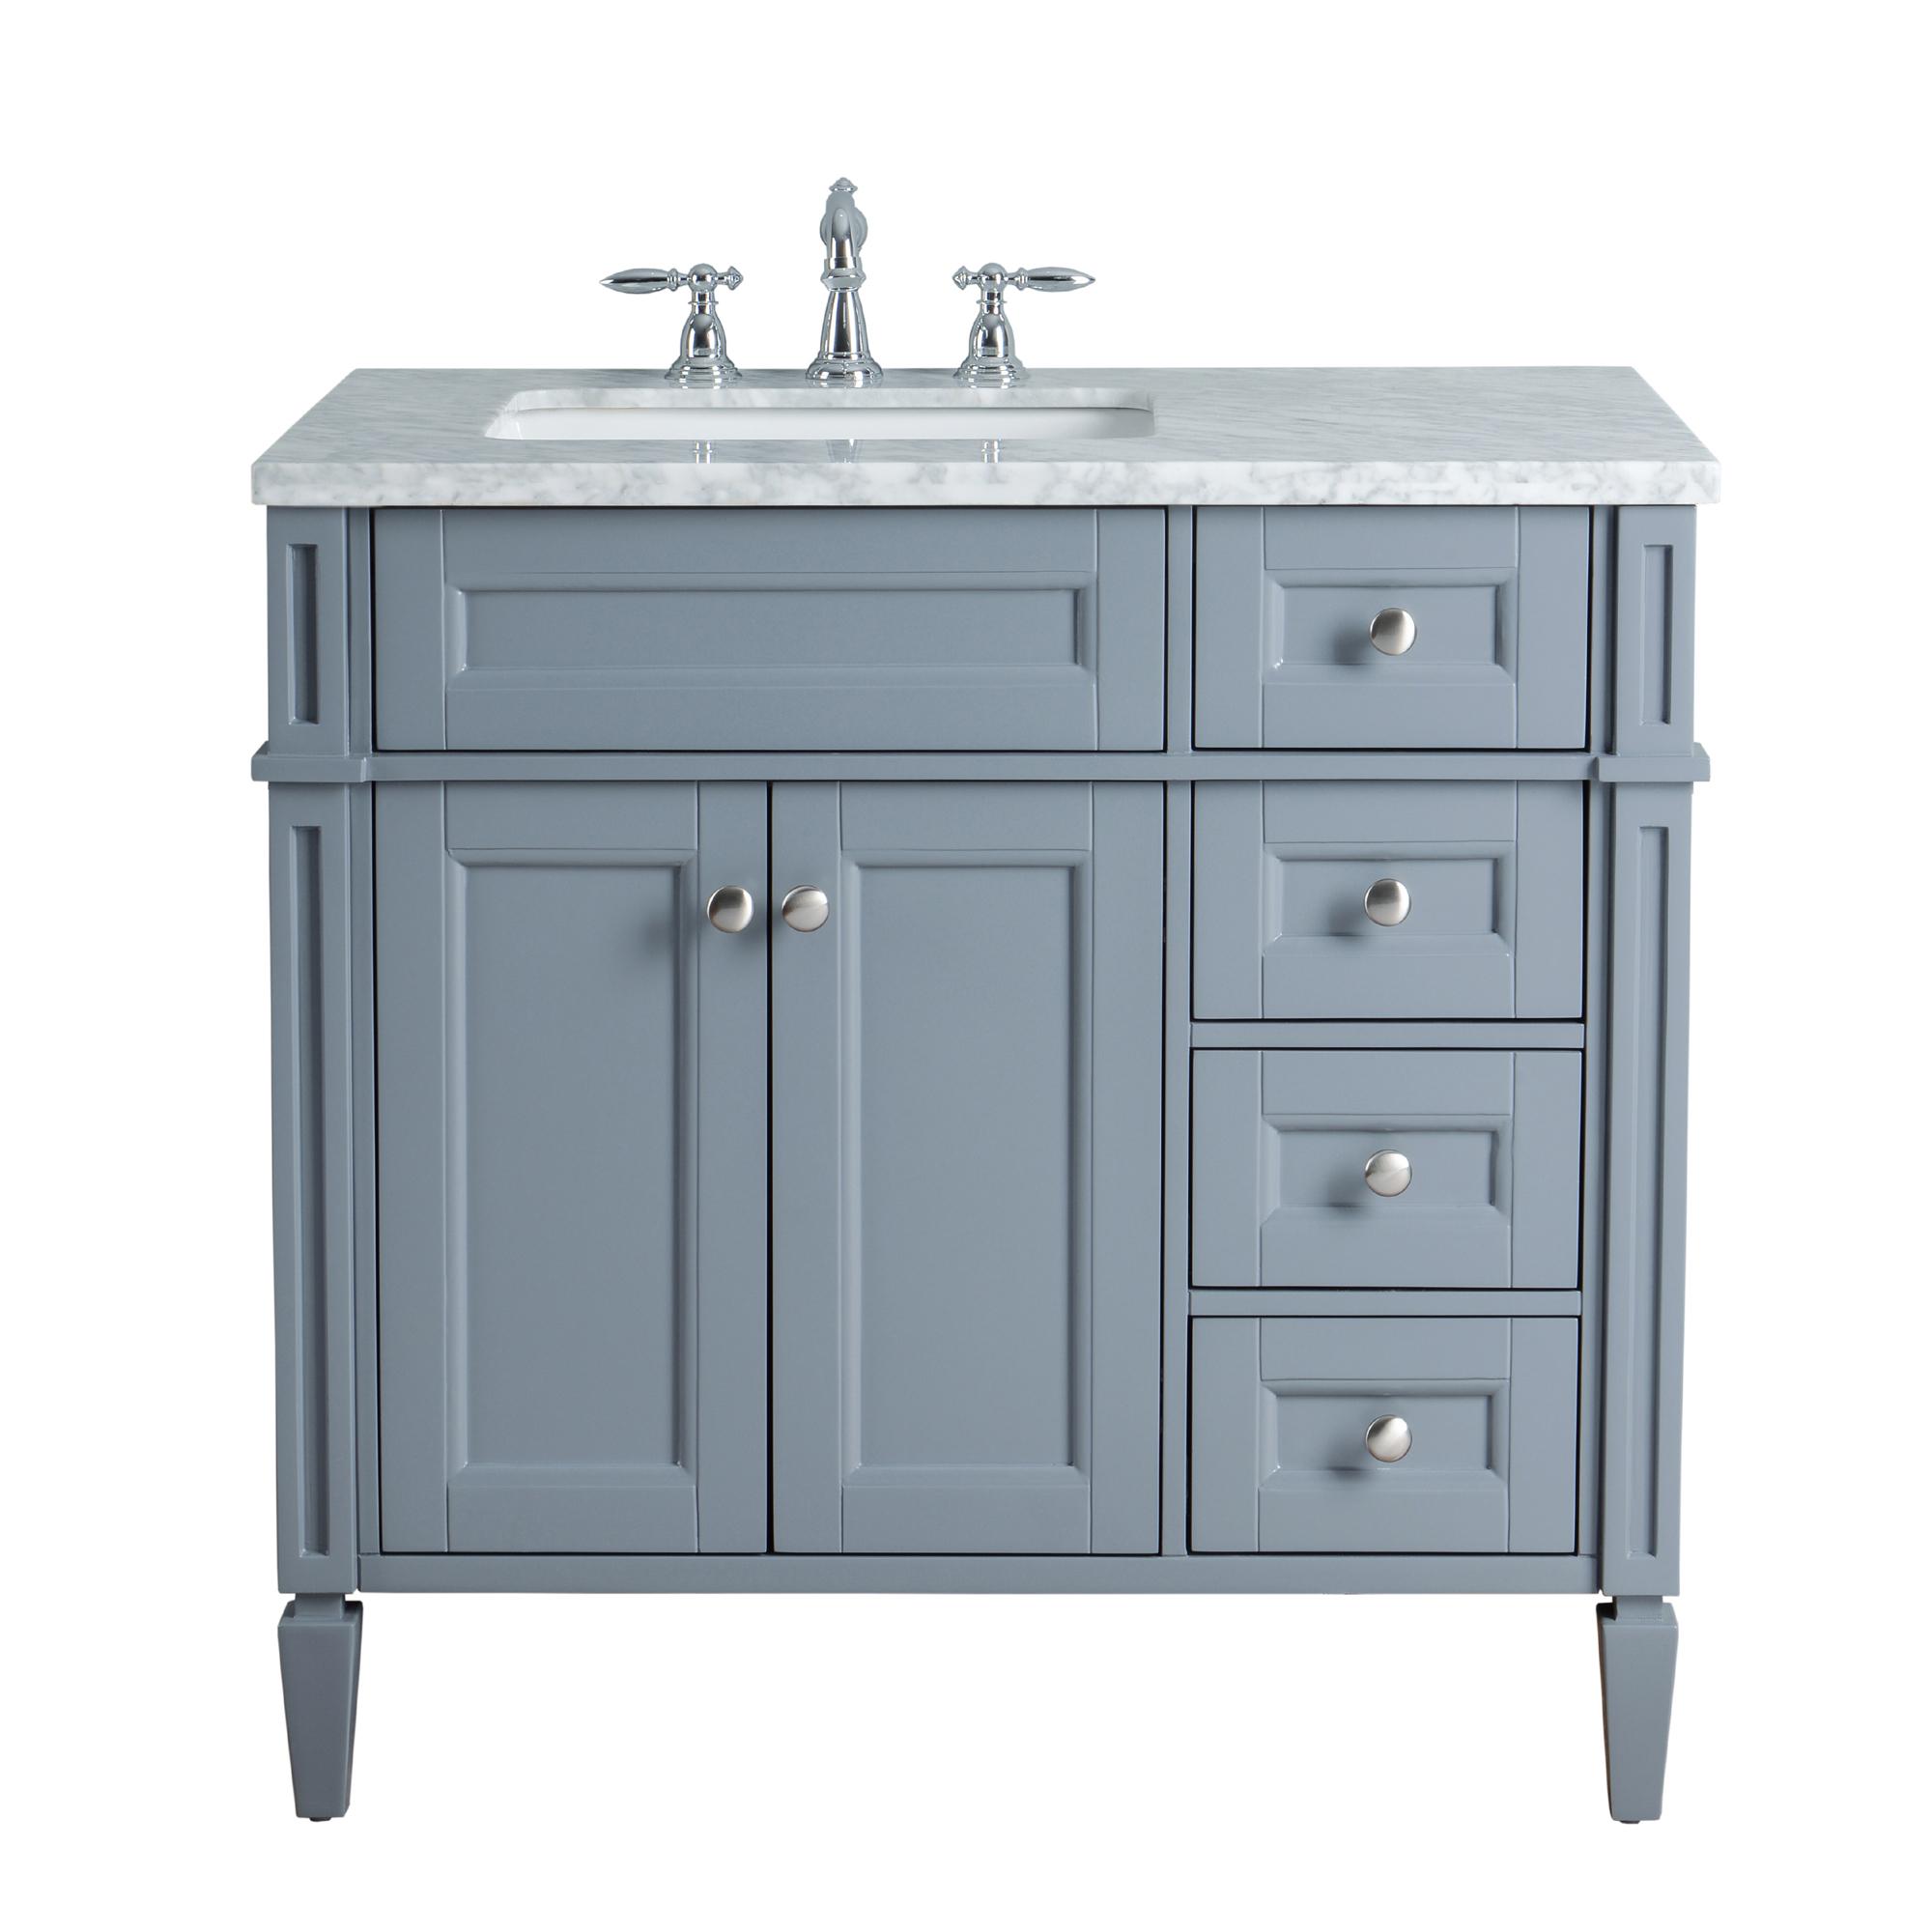 Anastasia French 36-inch Single Sink Bathroom Vanity - Grey